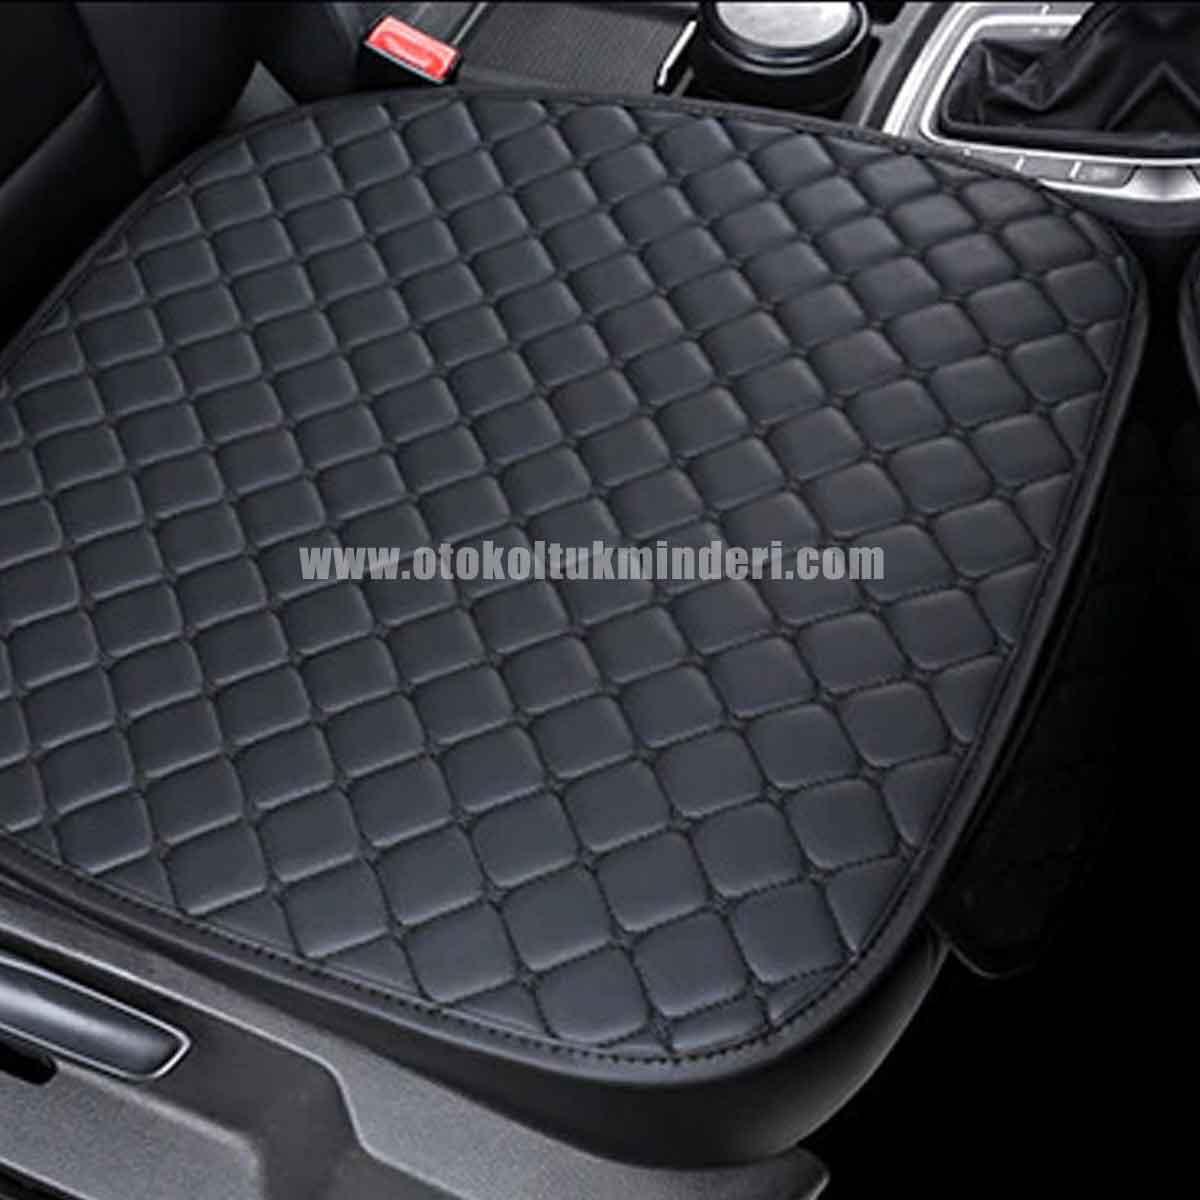 Ford oto koltuk kılıfı - Ford Koltuk minderi Siyah Deri Cepli